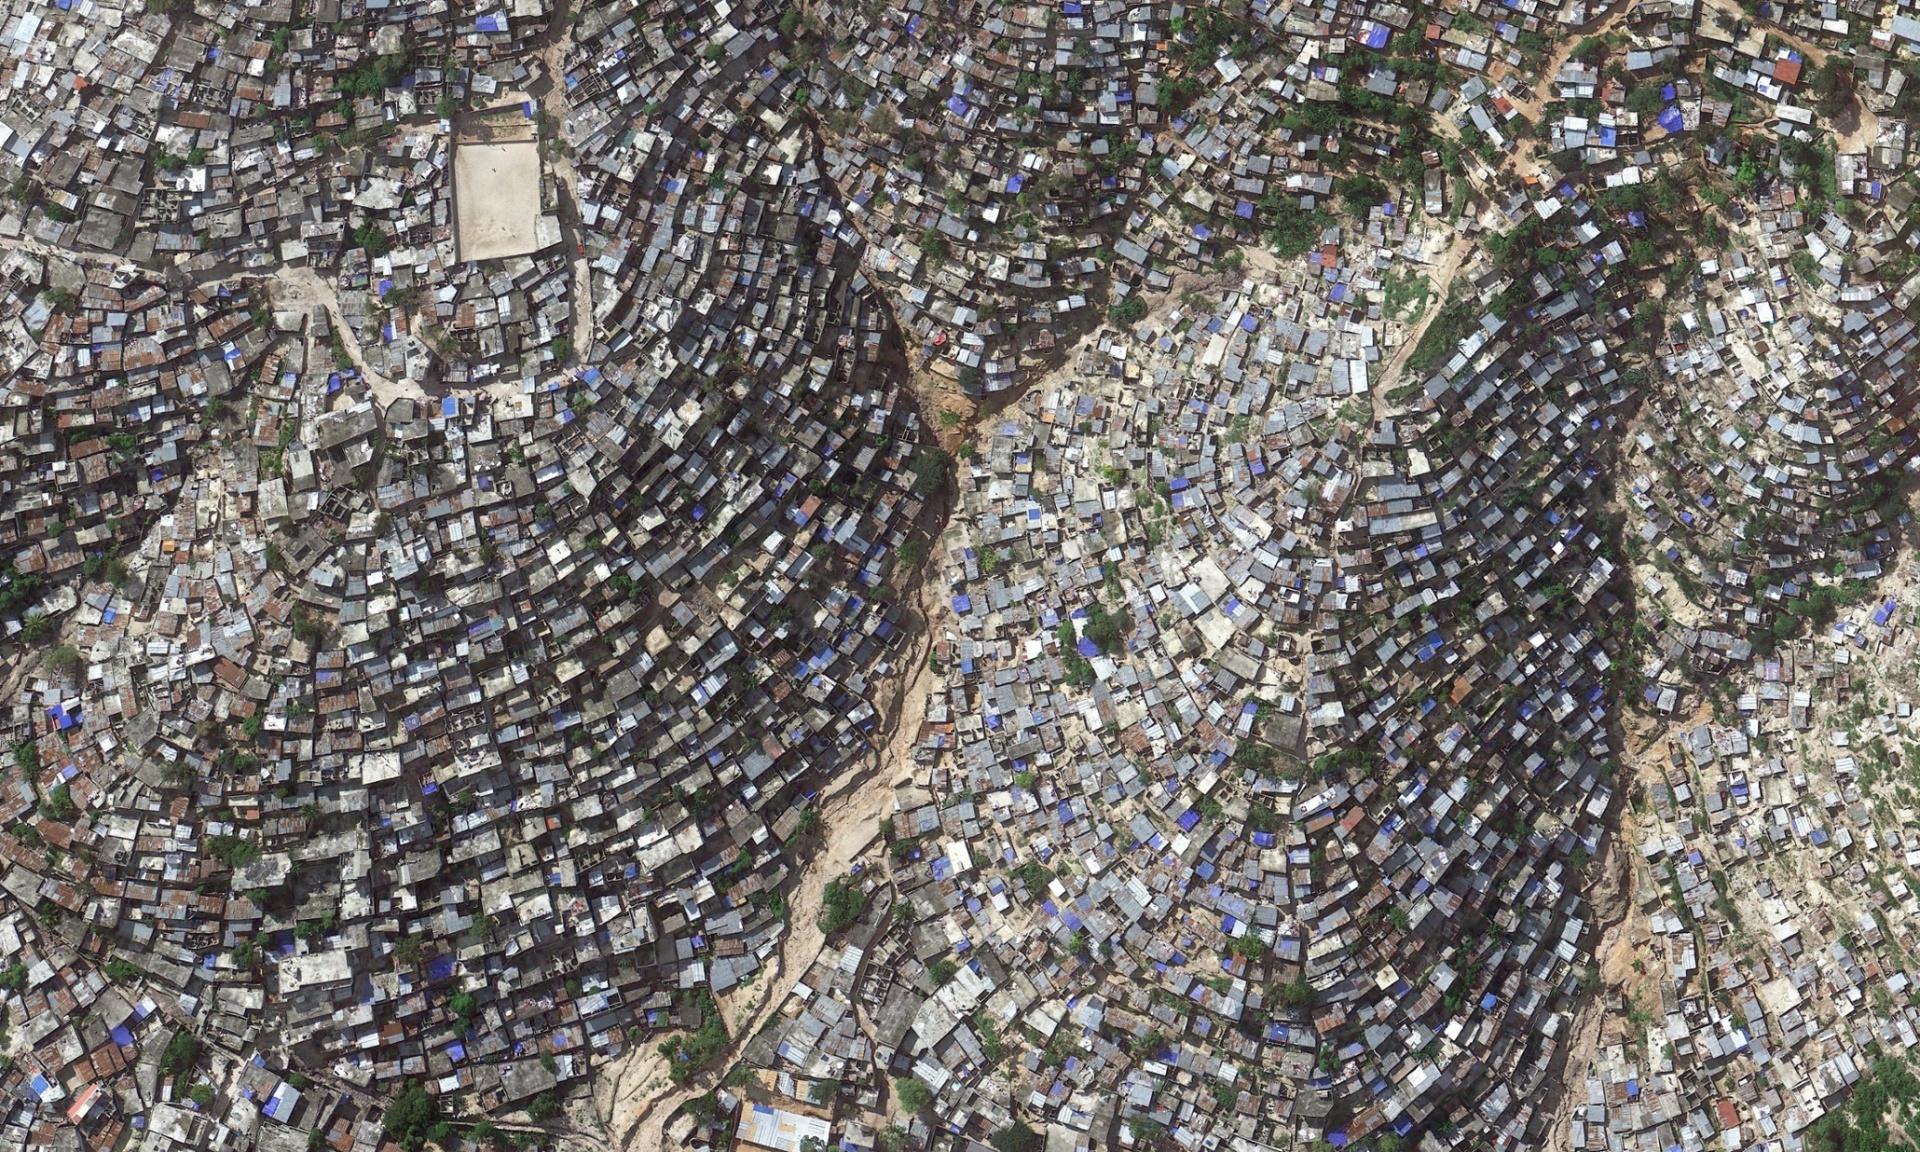 Hill side slum in Haiti